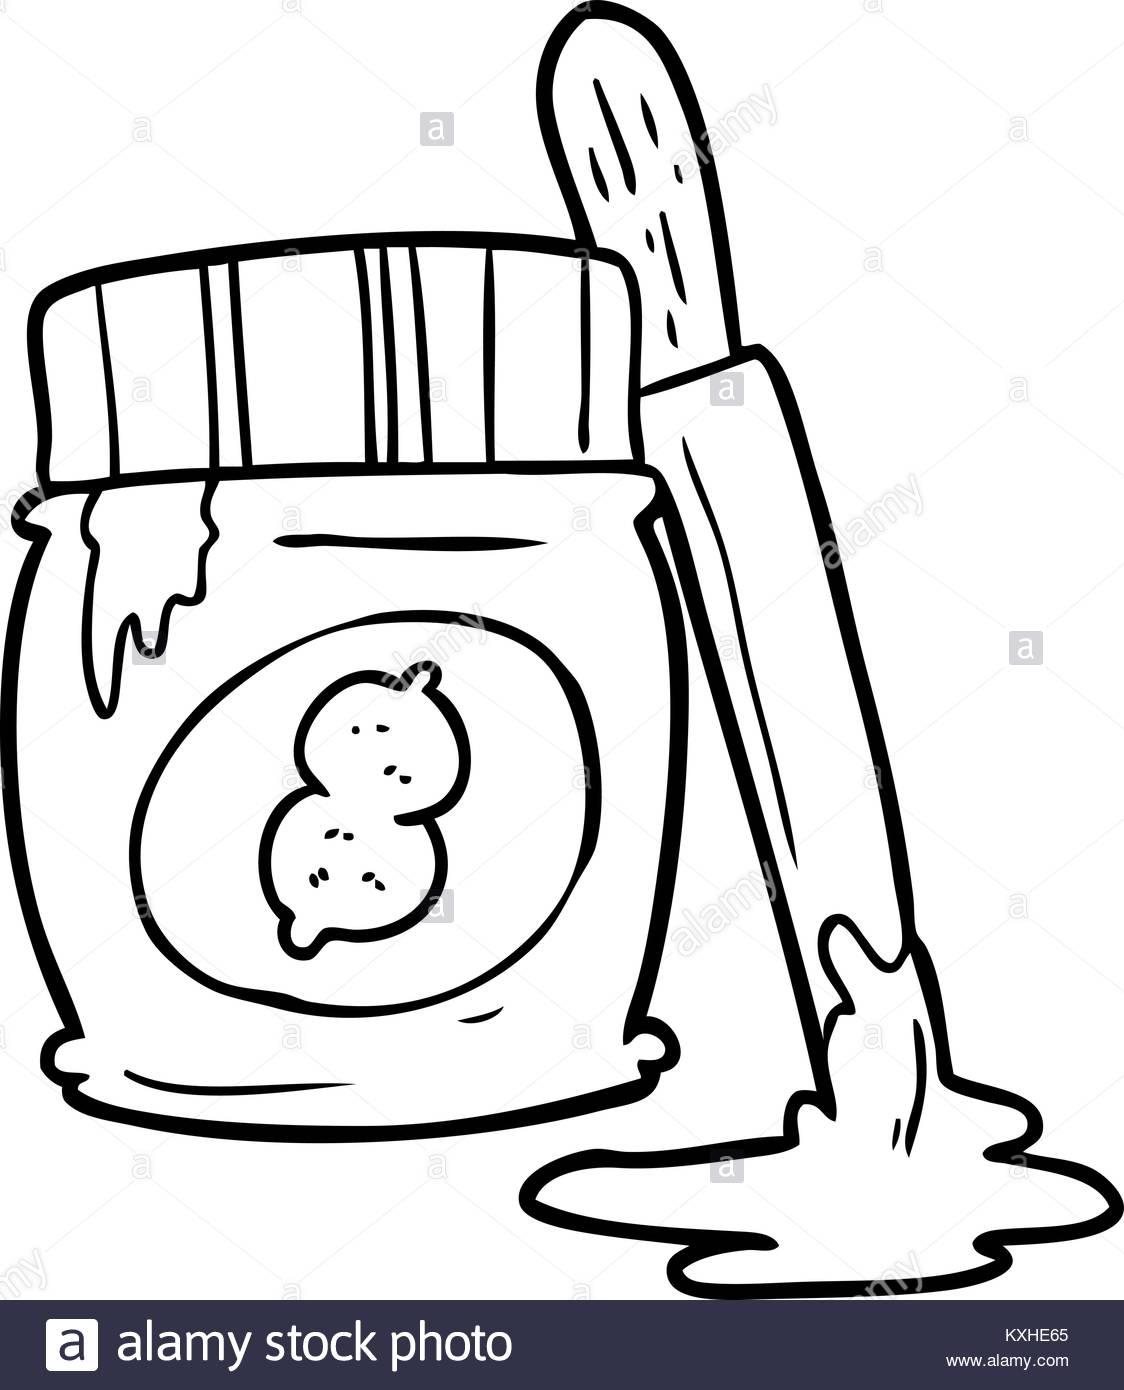 1124x1390 Cartoon Peanut Black And White Stock Photos Amp Images